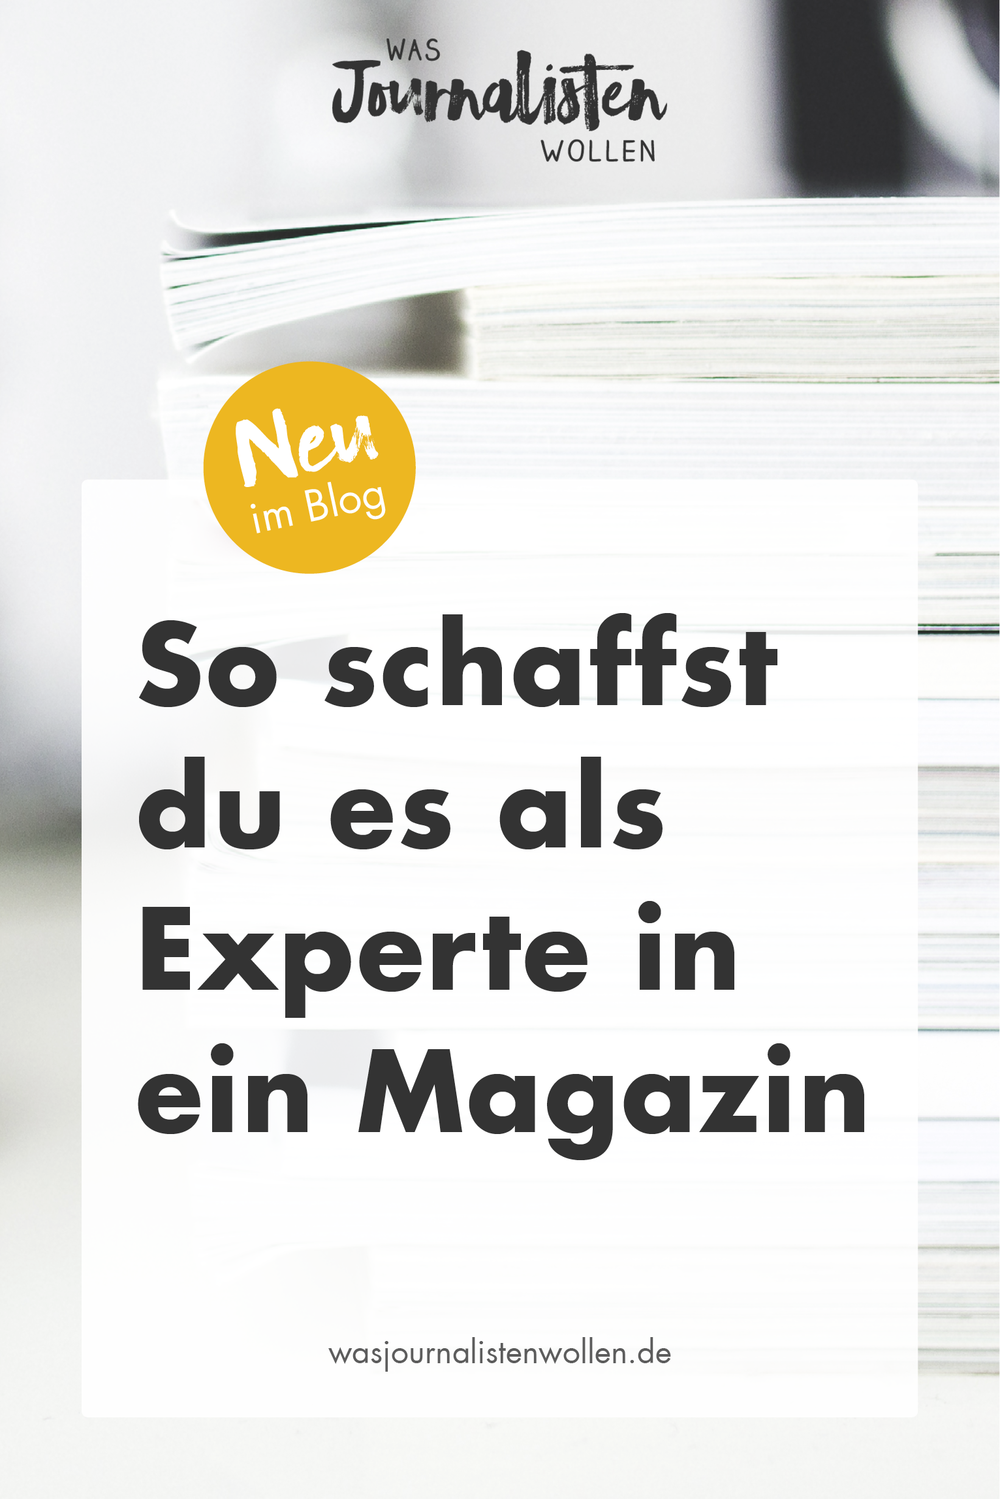 Blogpost_Experte_MF-2018-186-4_RZ_Beitrag.png